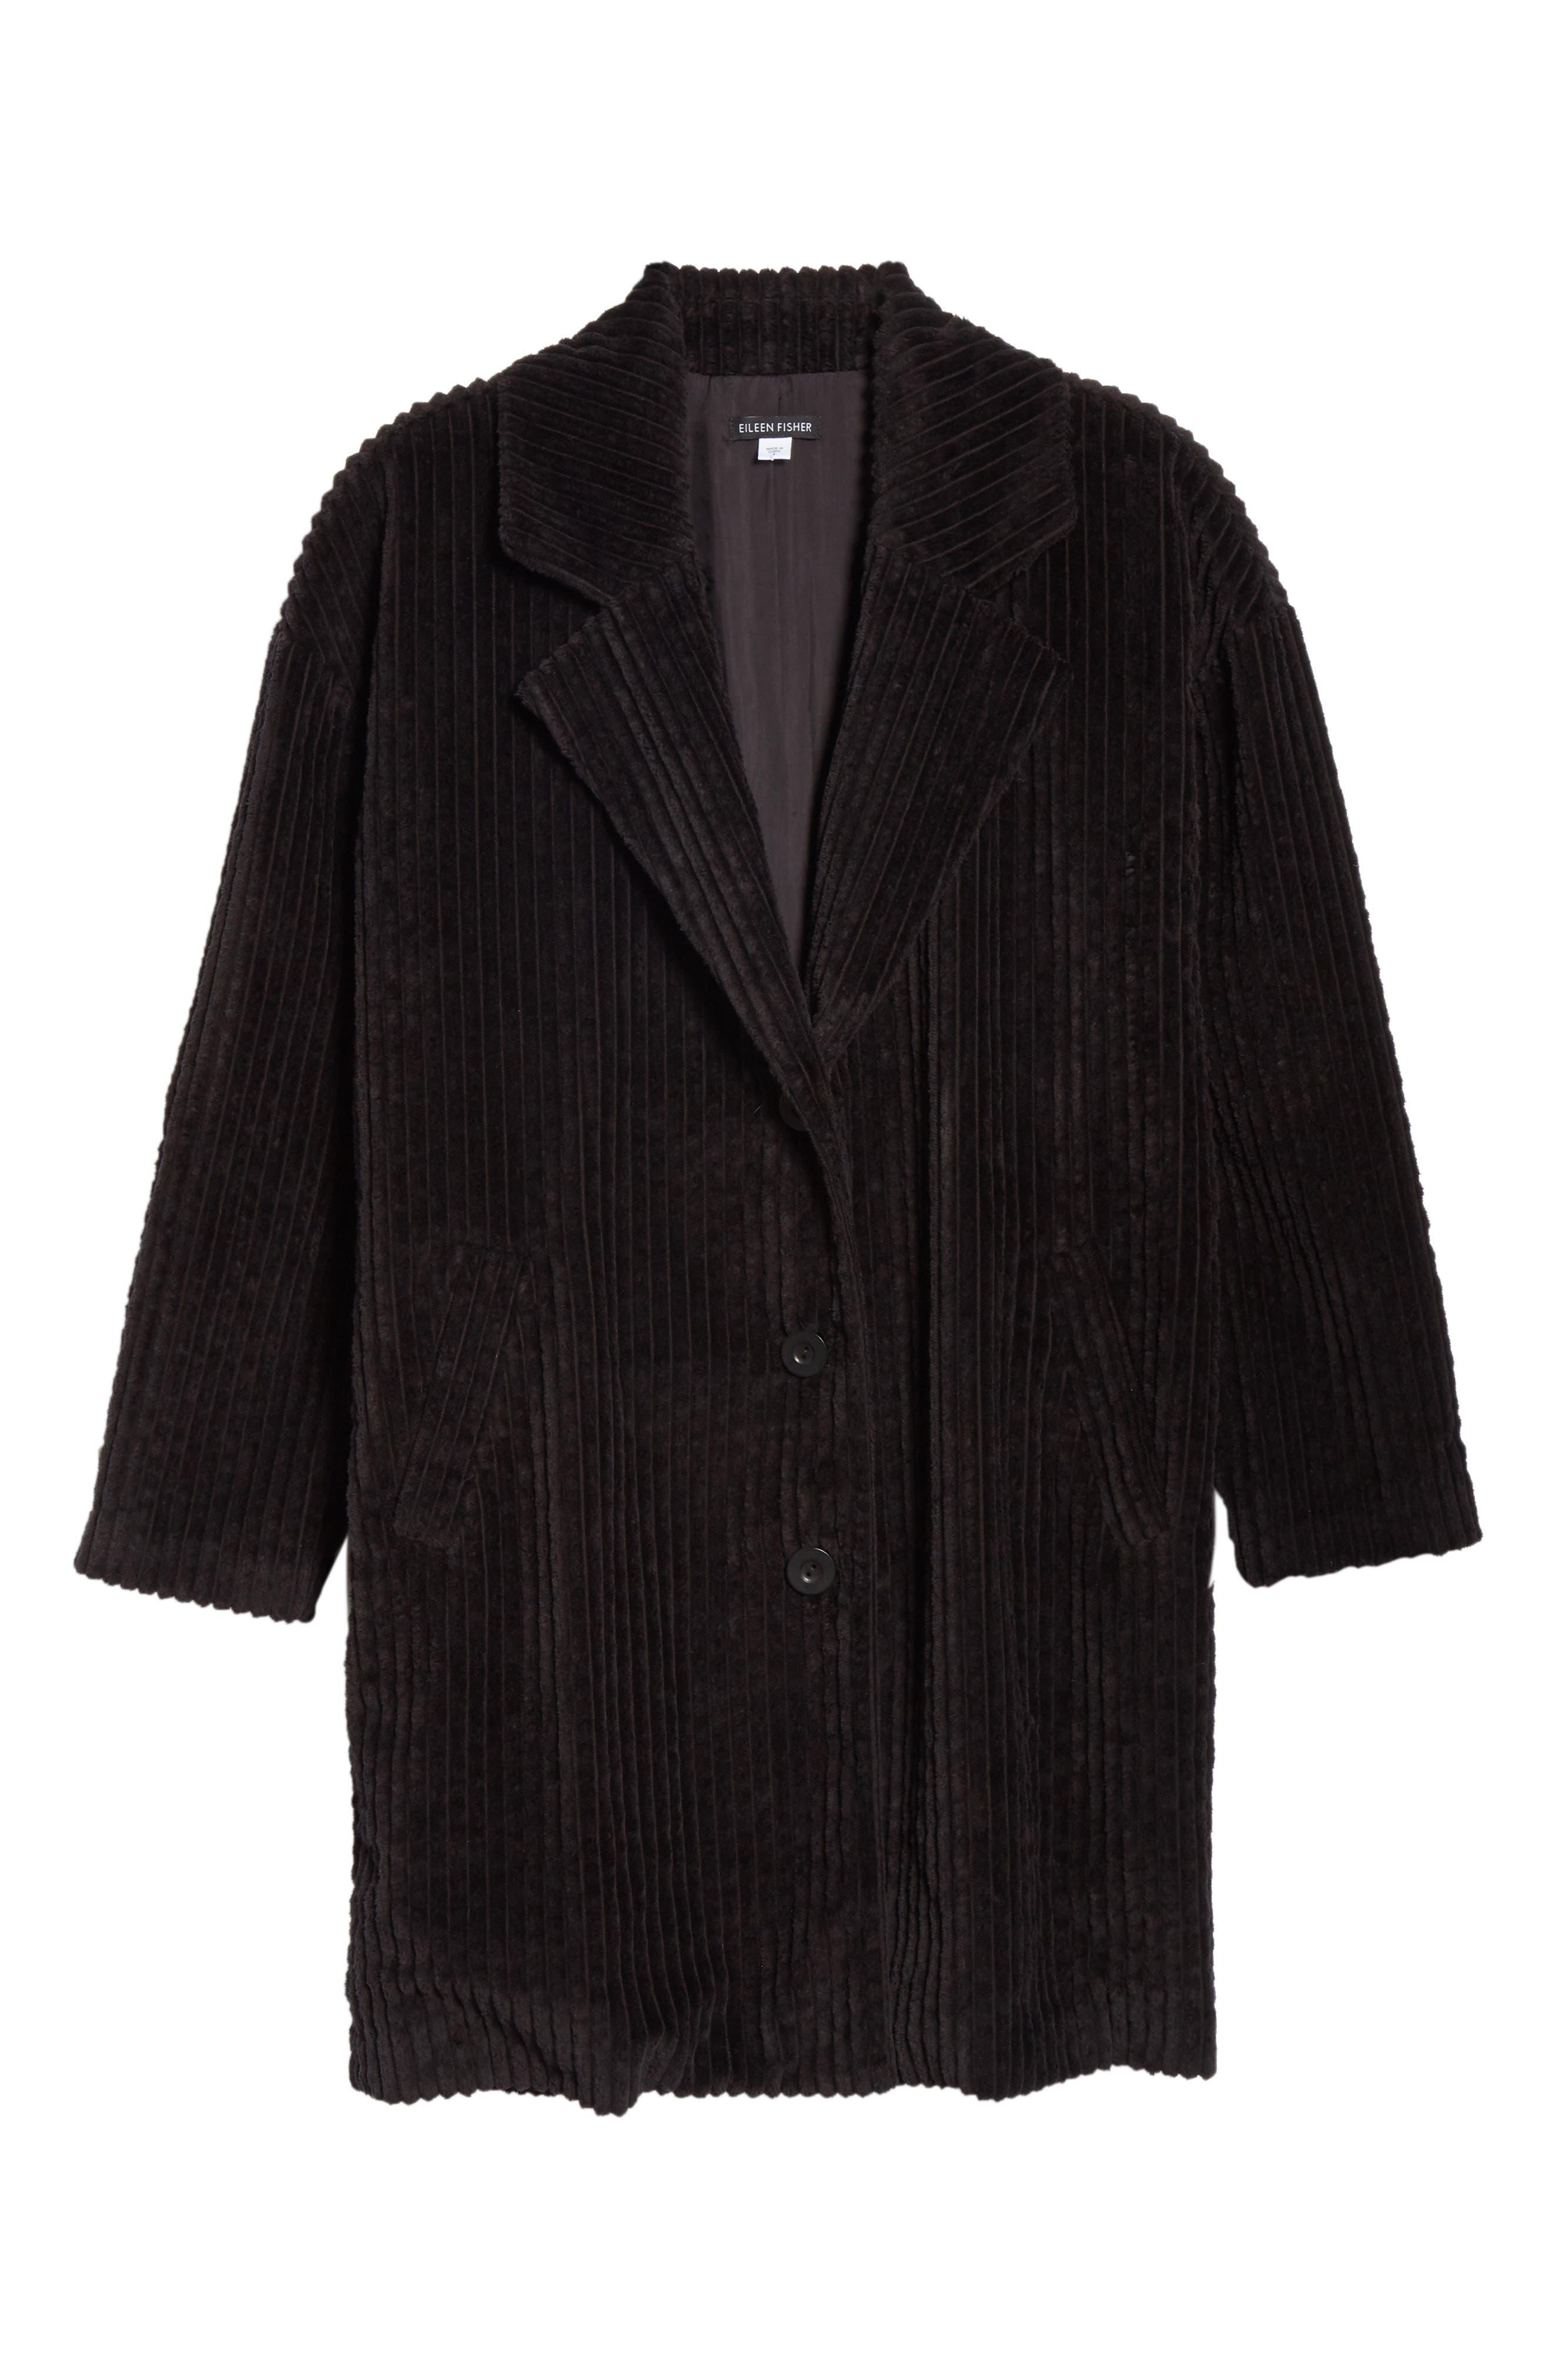 EILEEN FISHER,                             Organic Cotton Corduroy Coat,                             Alternate thumbnail 6, color,                             001